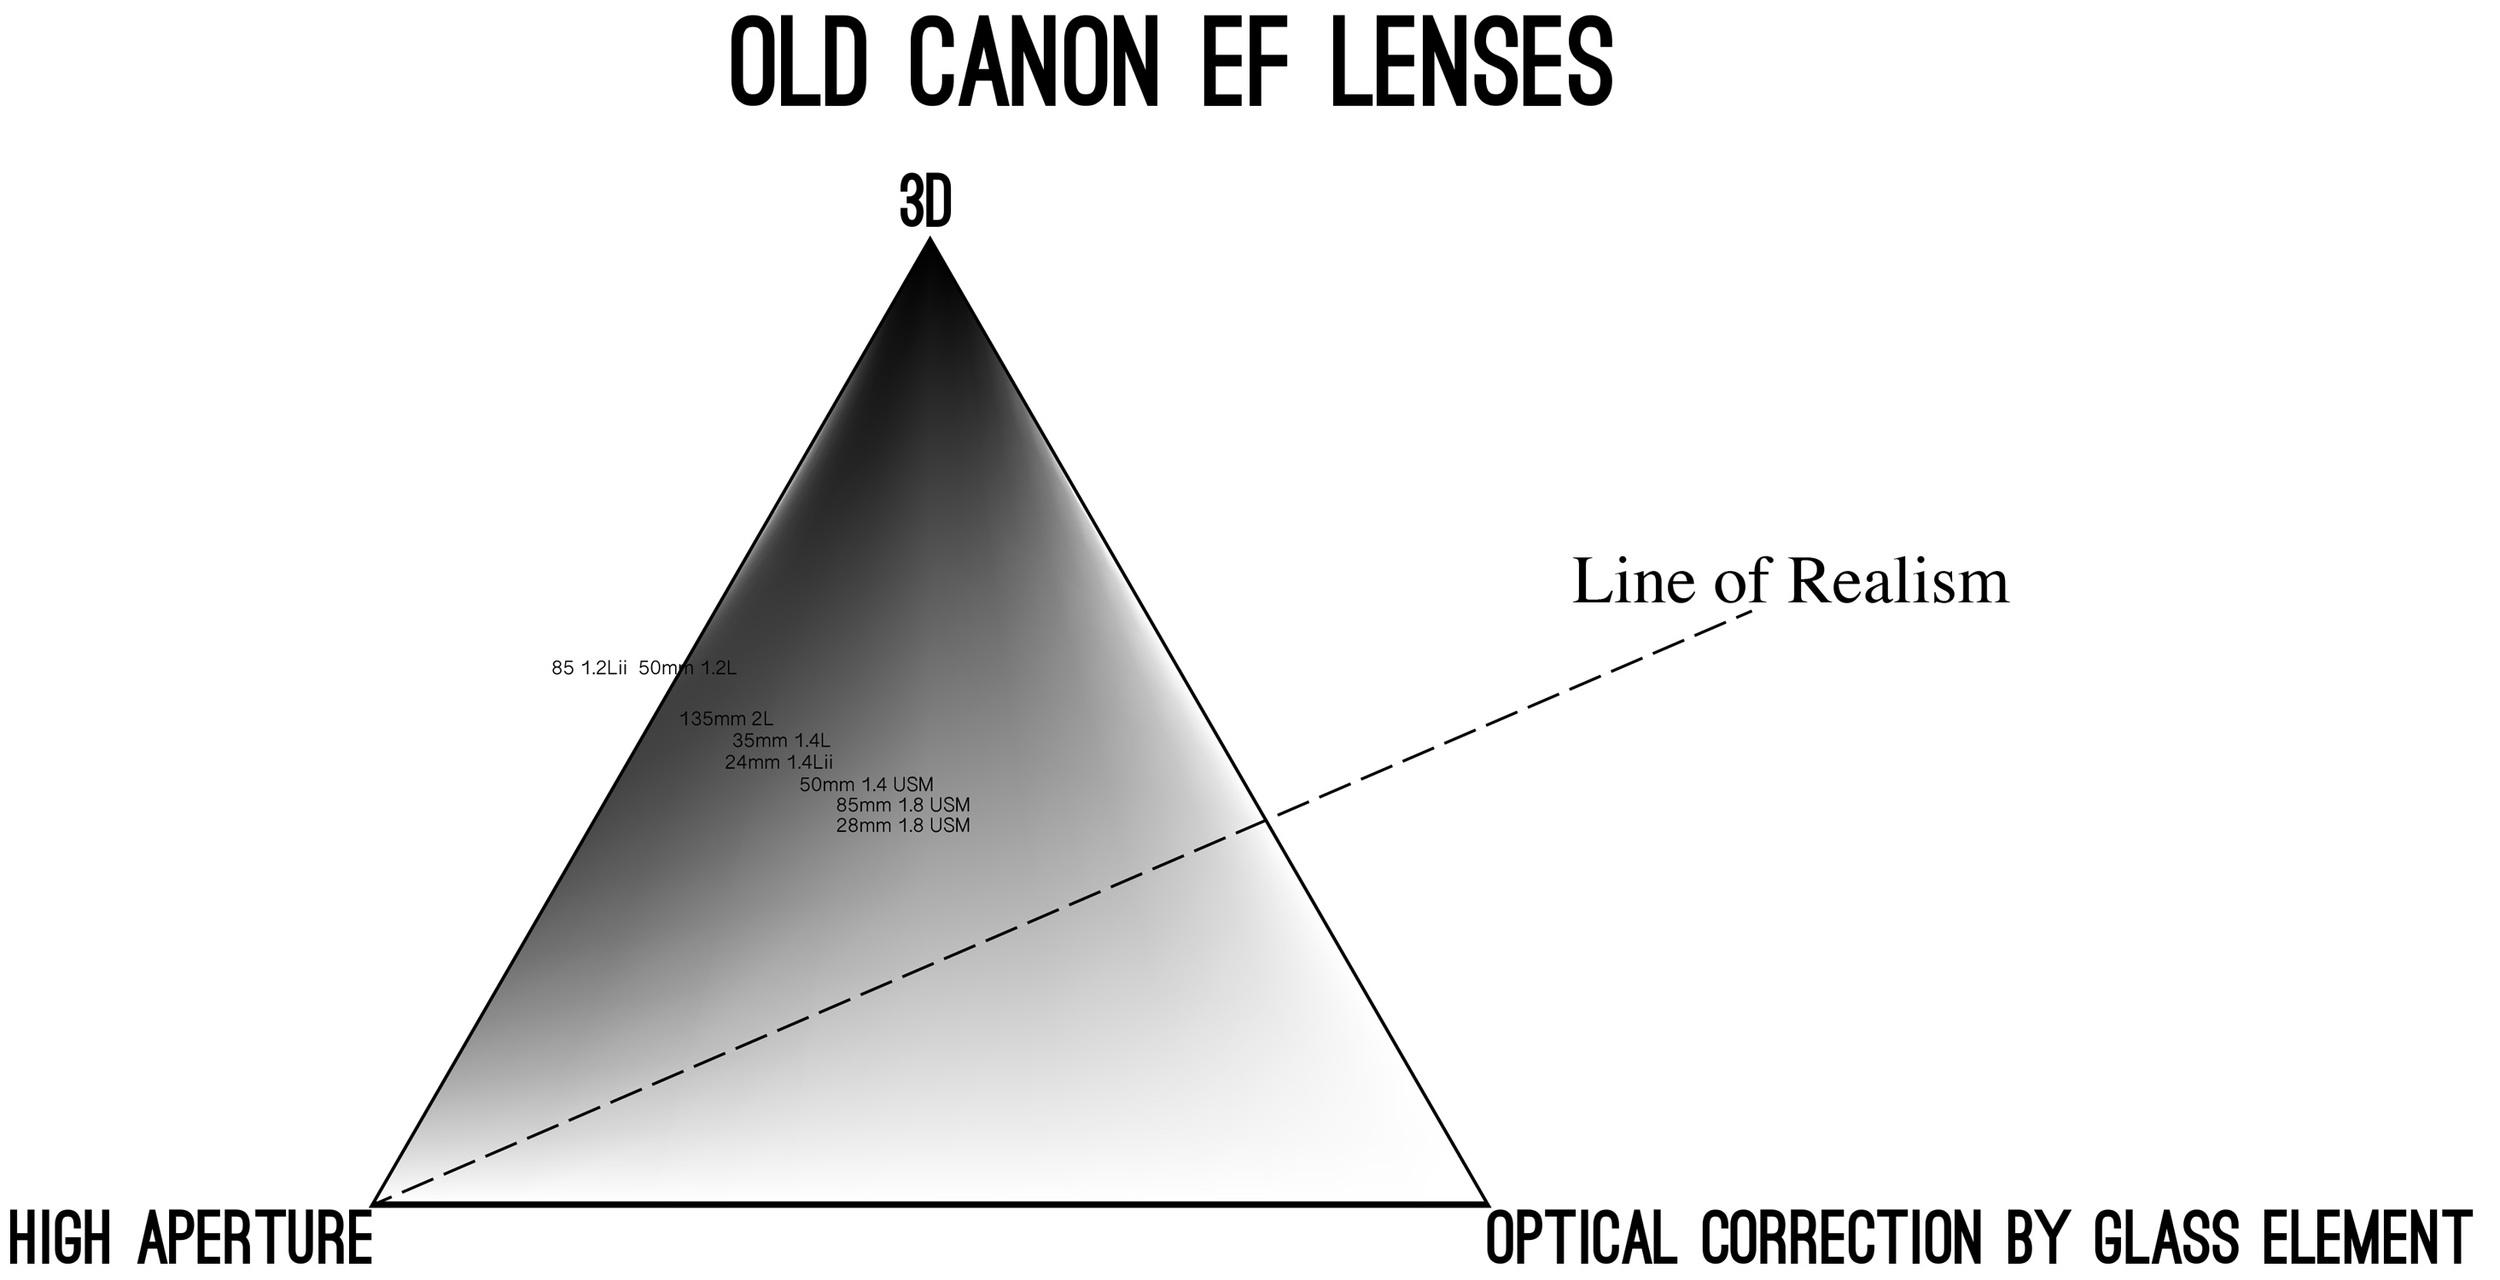 20160223-diagram-canon-old.jpg